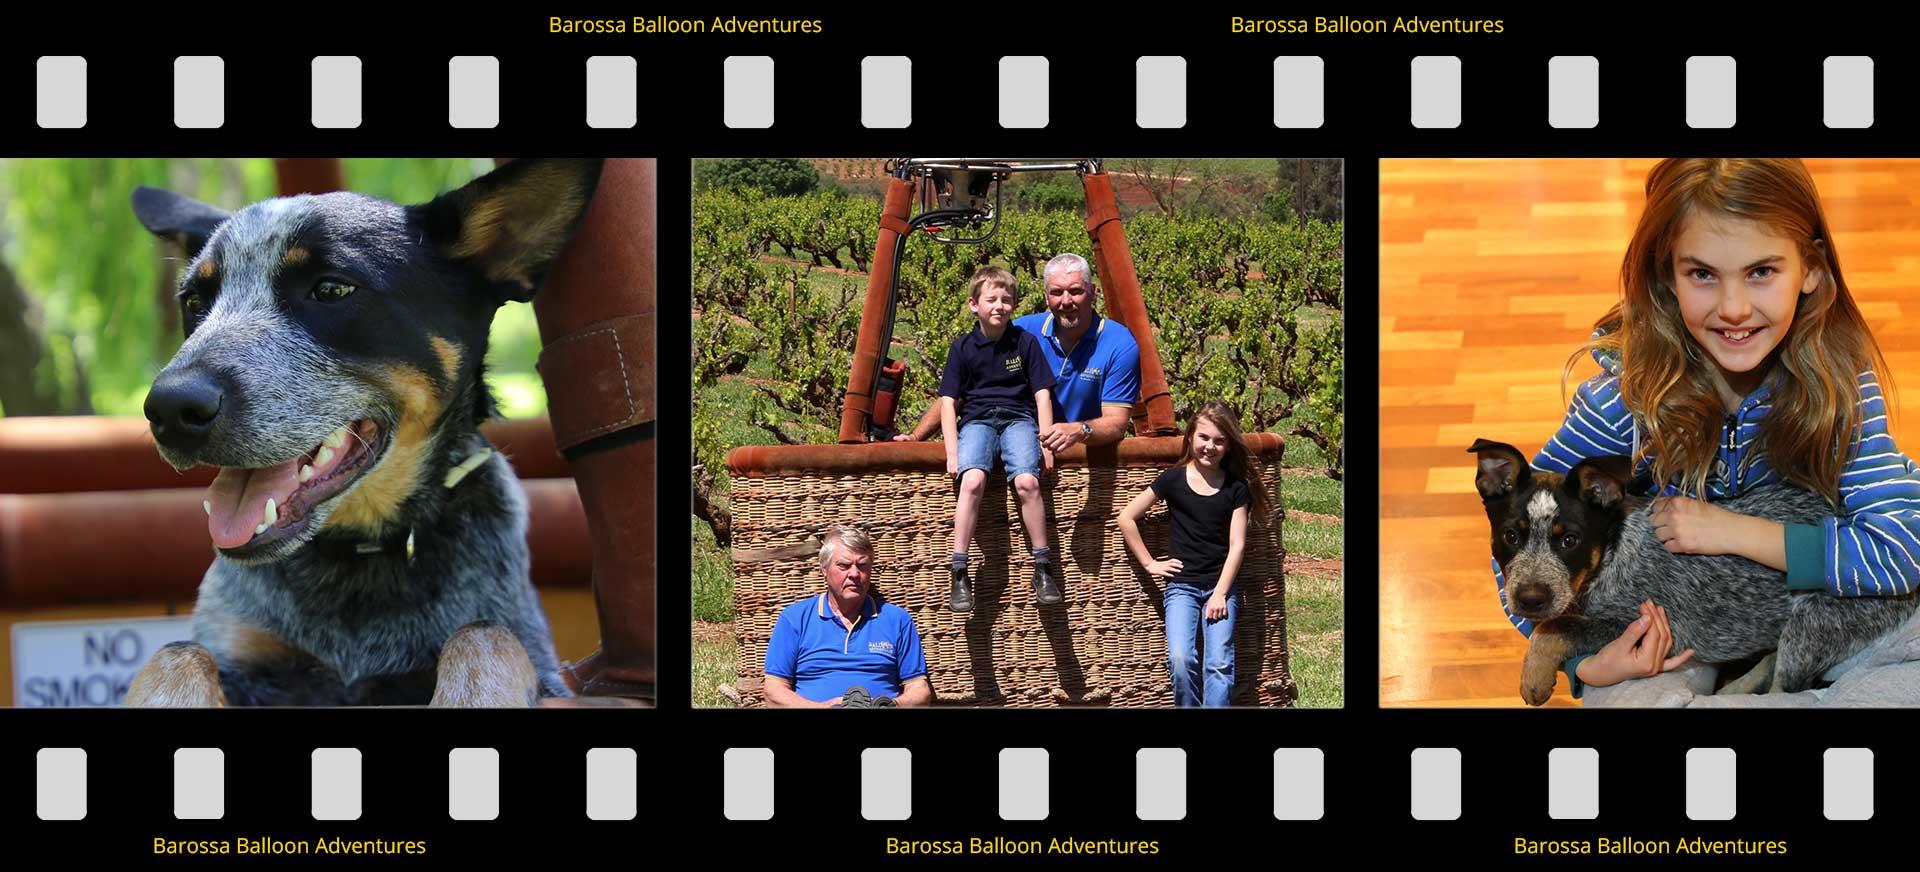 balloon-adventures-family-film-strip-with-gibson